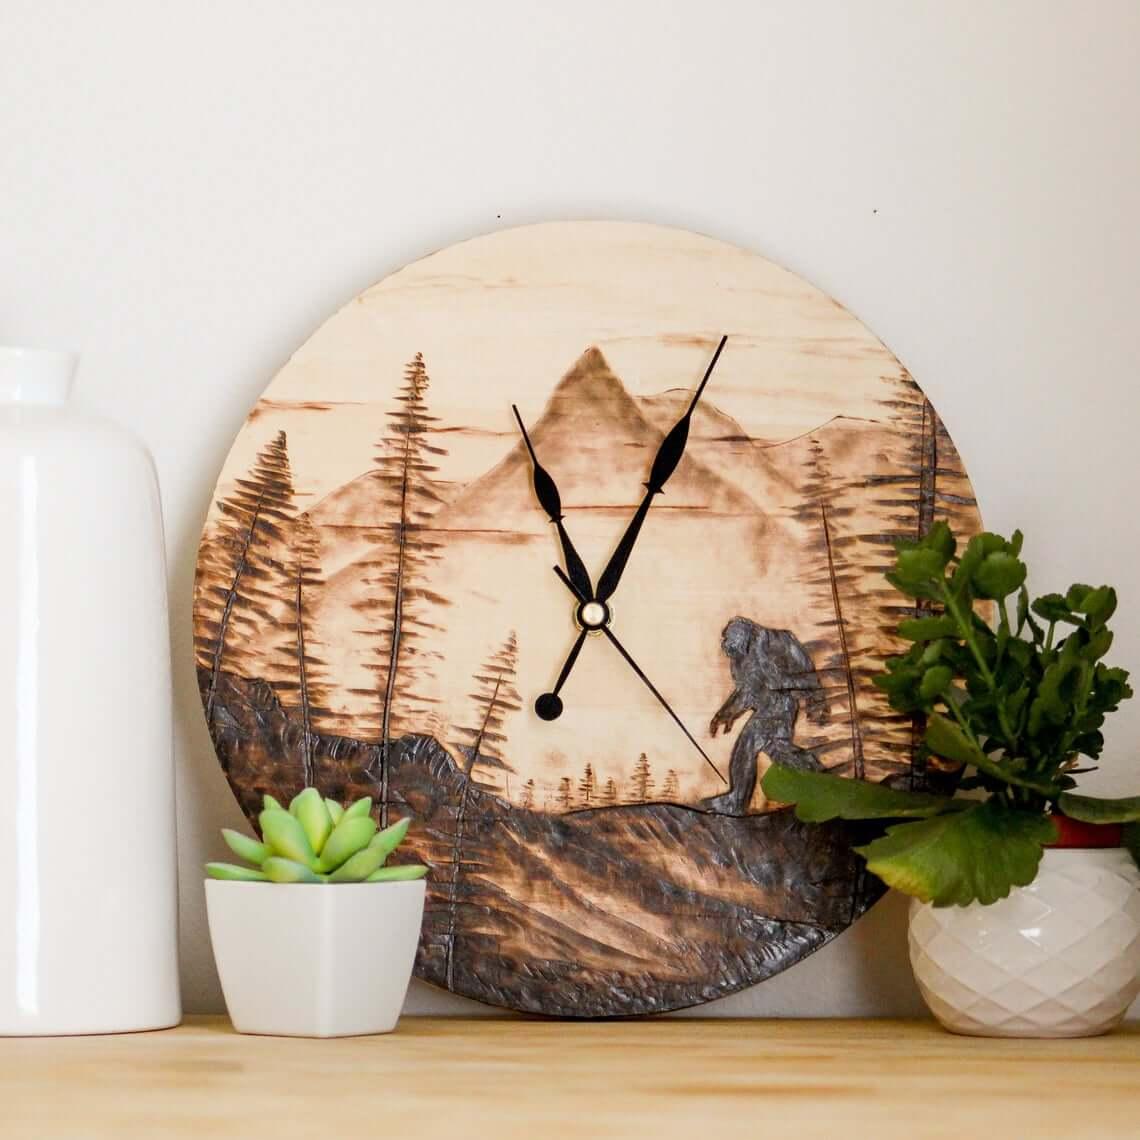 28 Best Diy Wood Burning Ideas To Add Rustic Charm In 2020